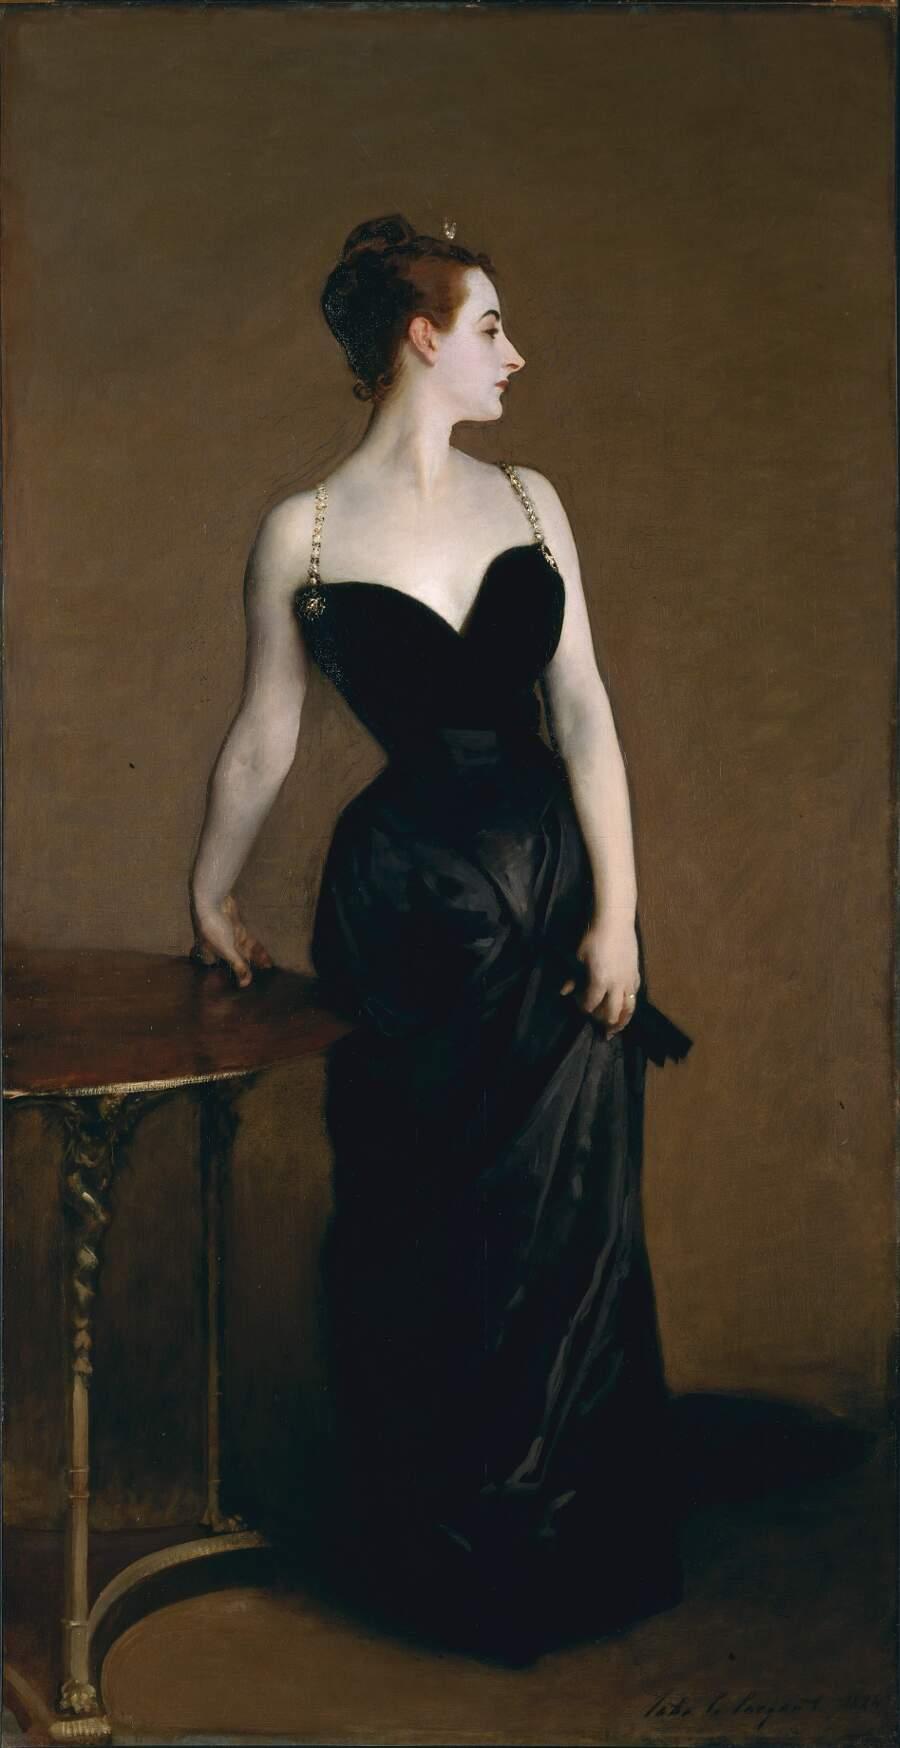 Storie interessanti dipinti famosi - Ritratto di Madame X, John Singer Sargent